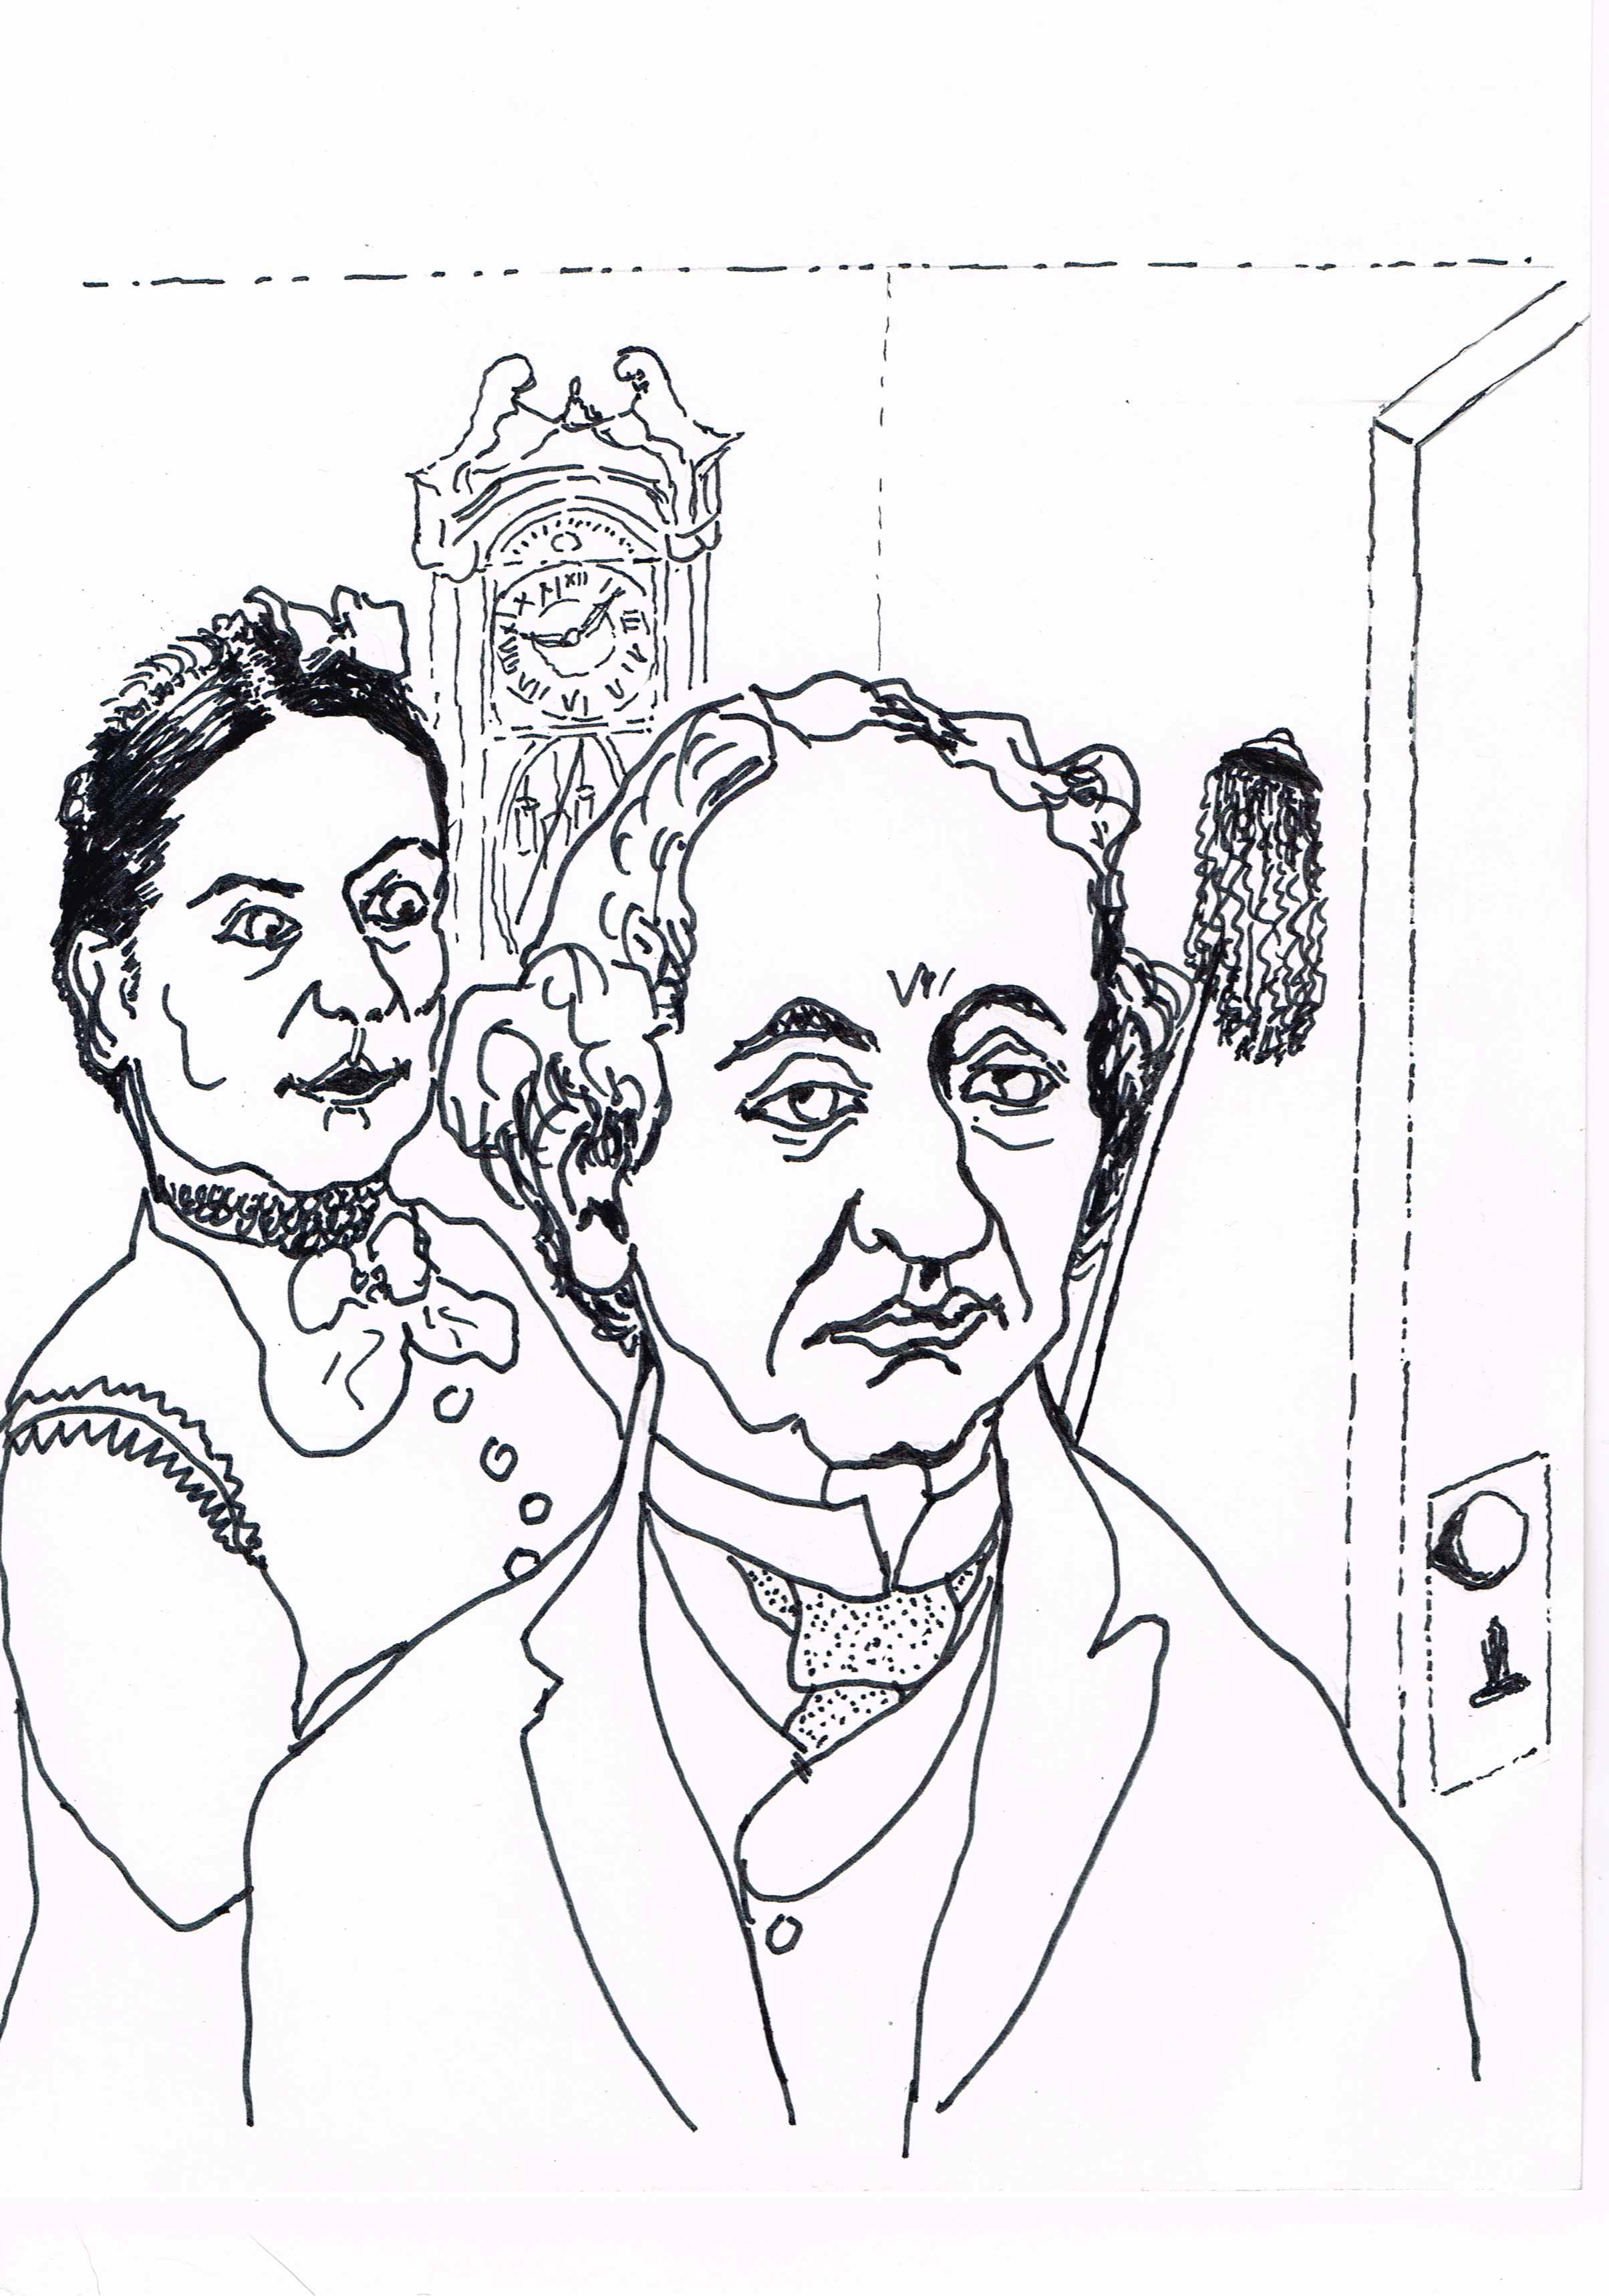 Sir John A. Macdonald's 200th birthday.The secret threads of history.